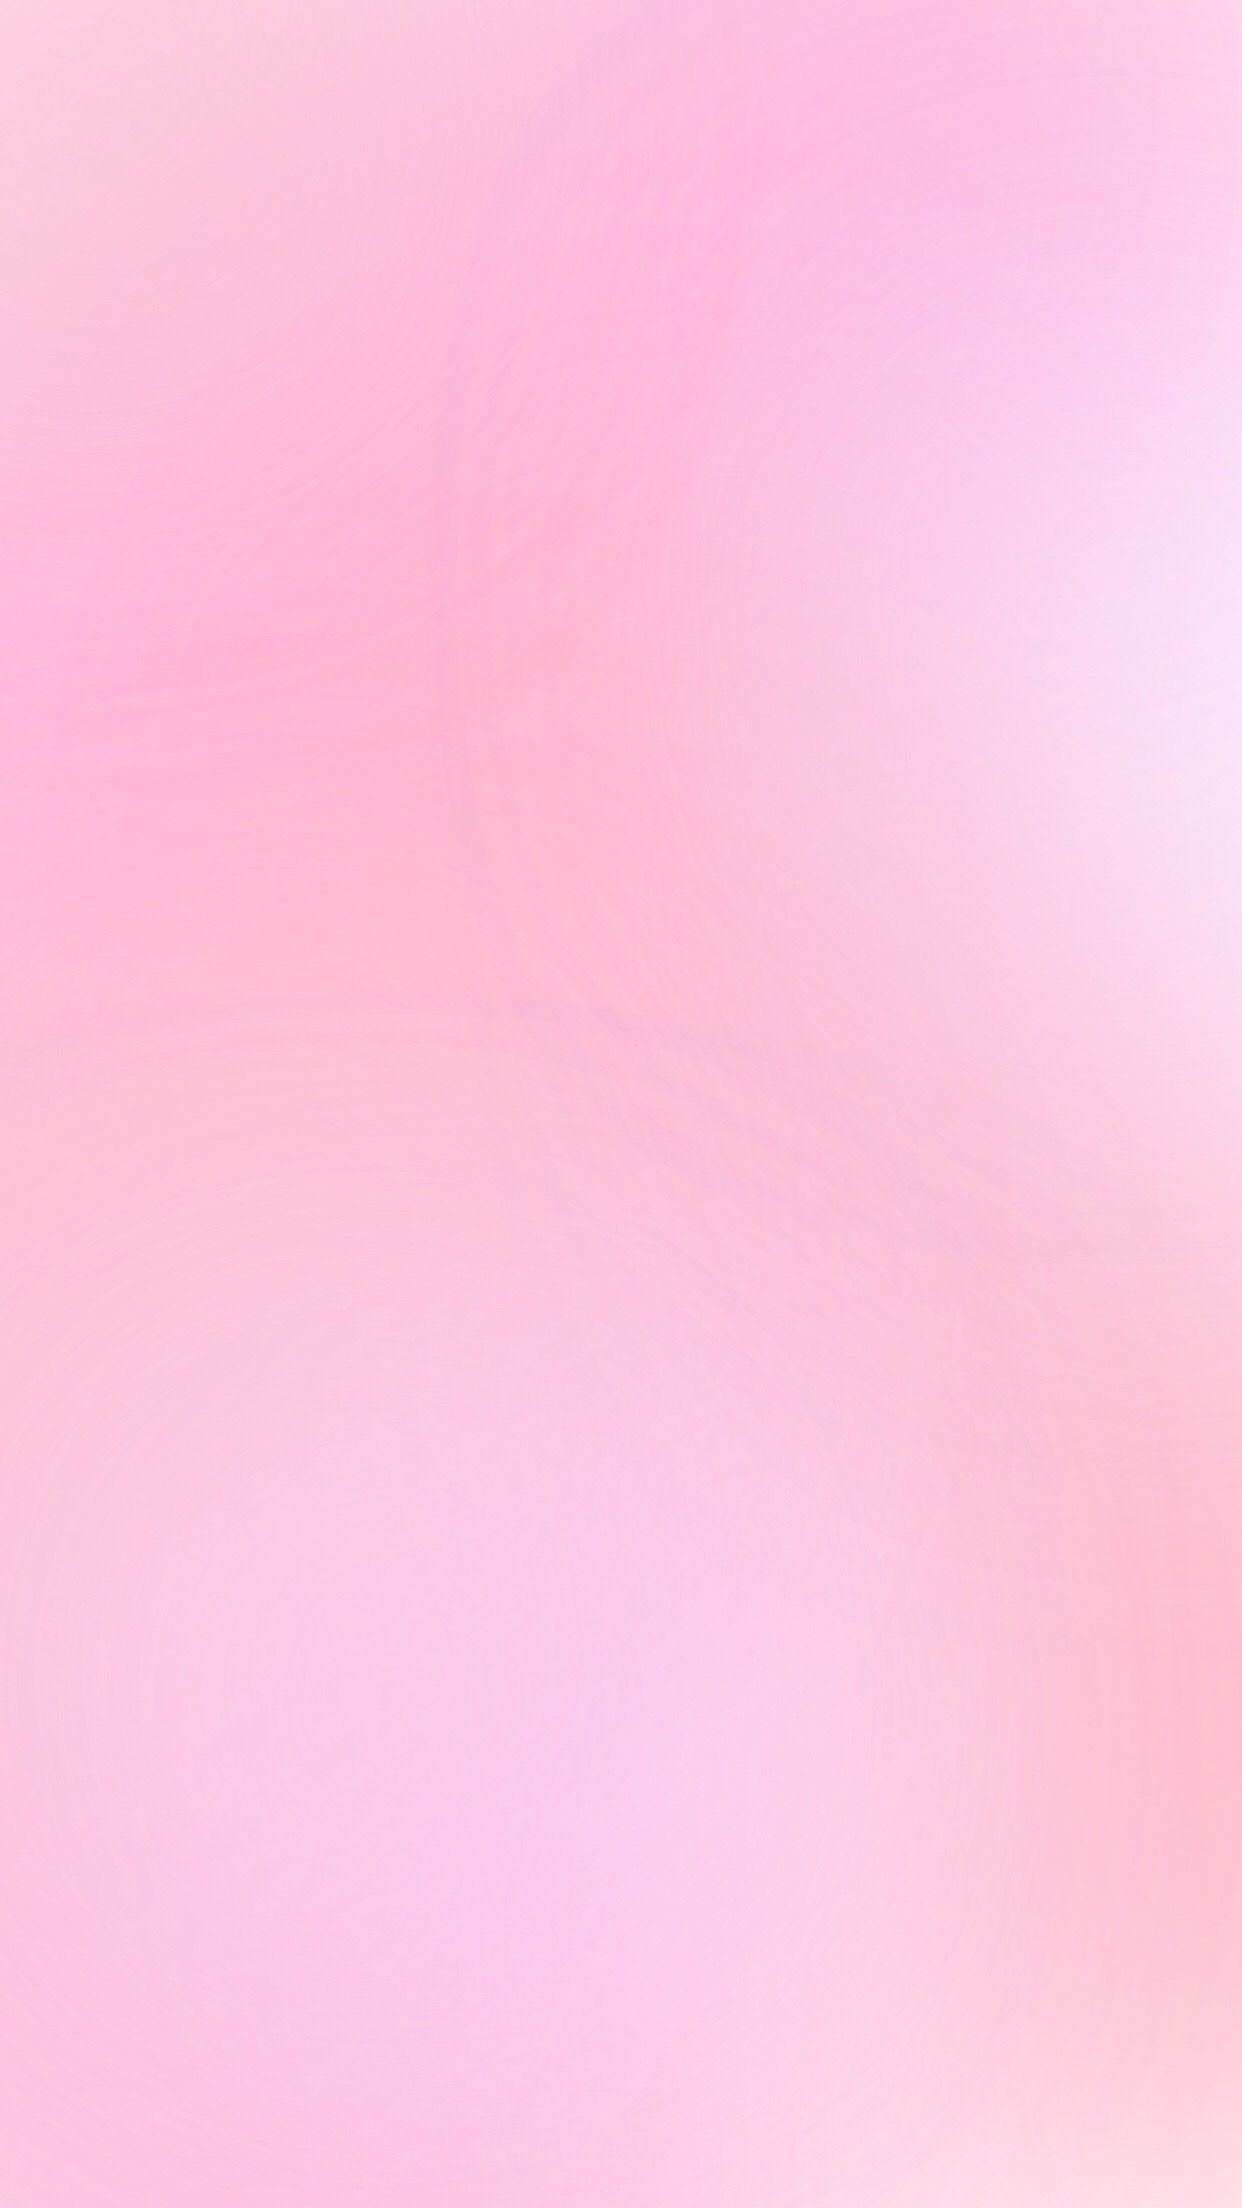 Pastel Pink Ombre (Gradient) Phone Wallpaper